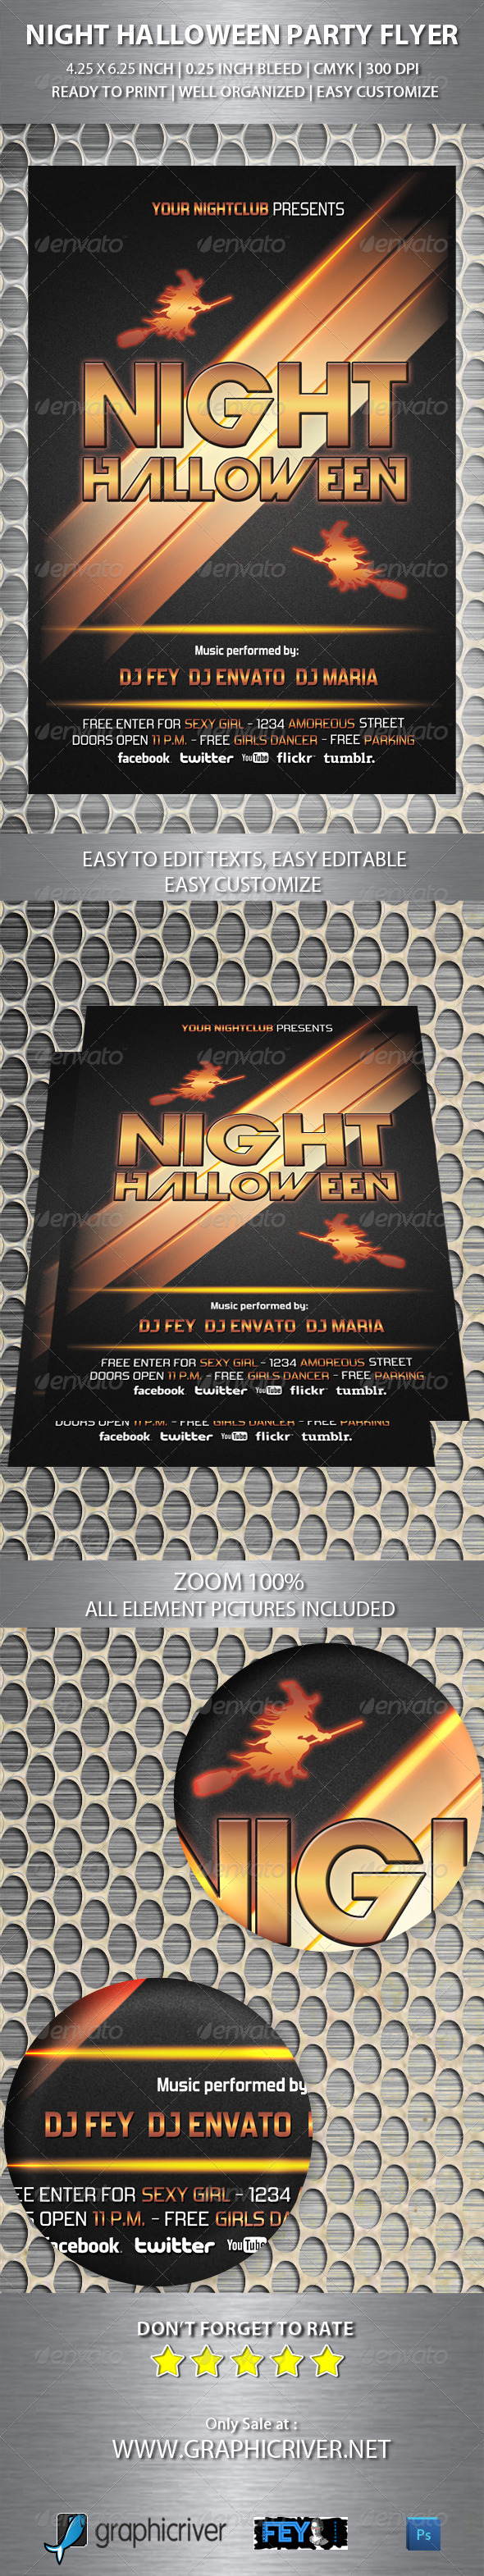 Night Halloween Party Flyer